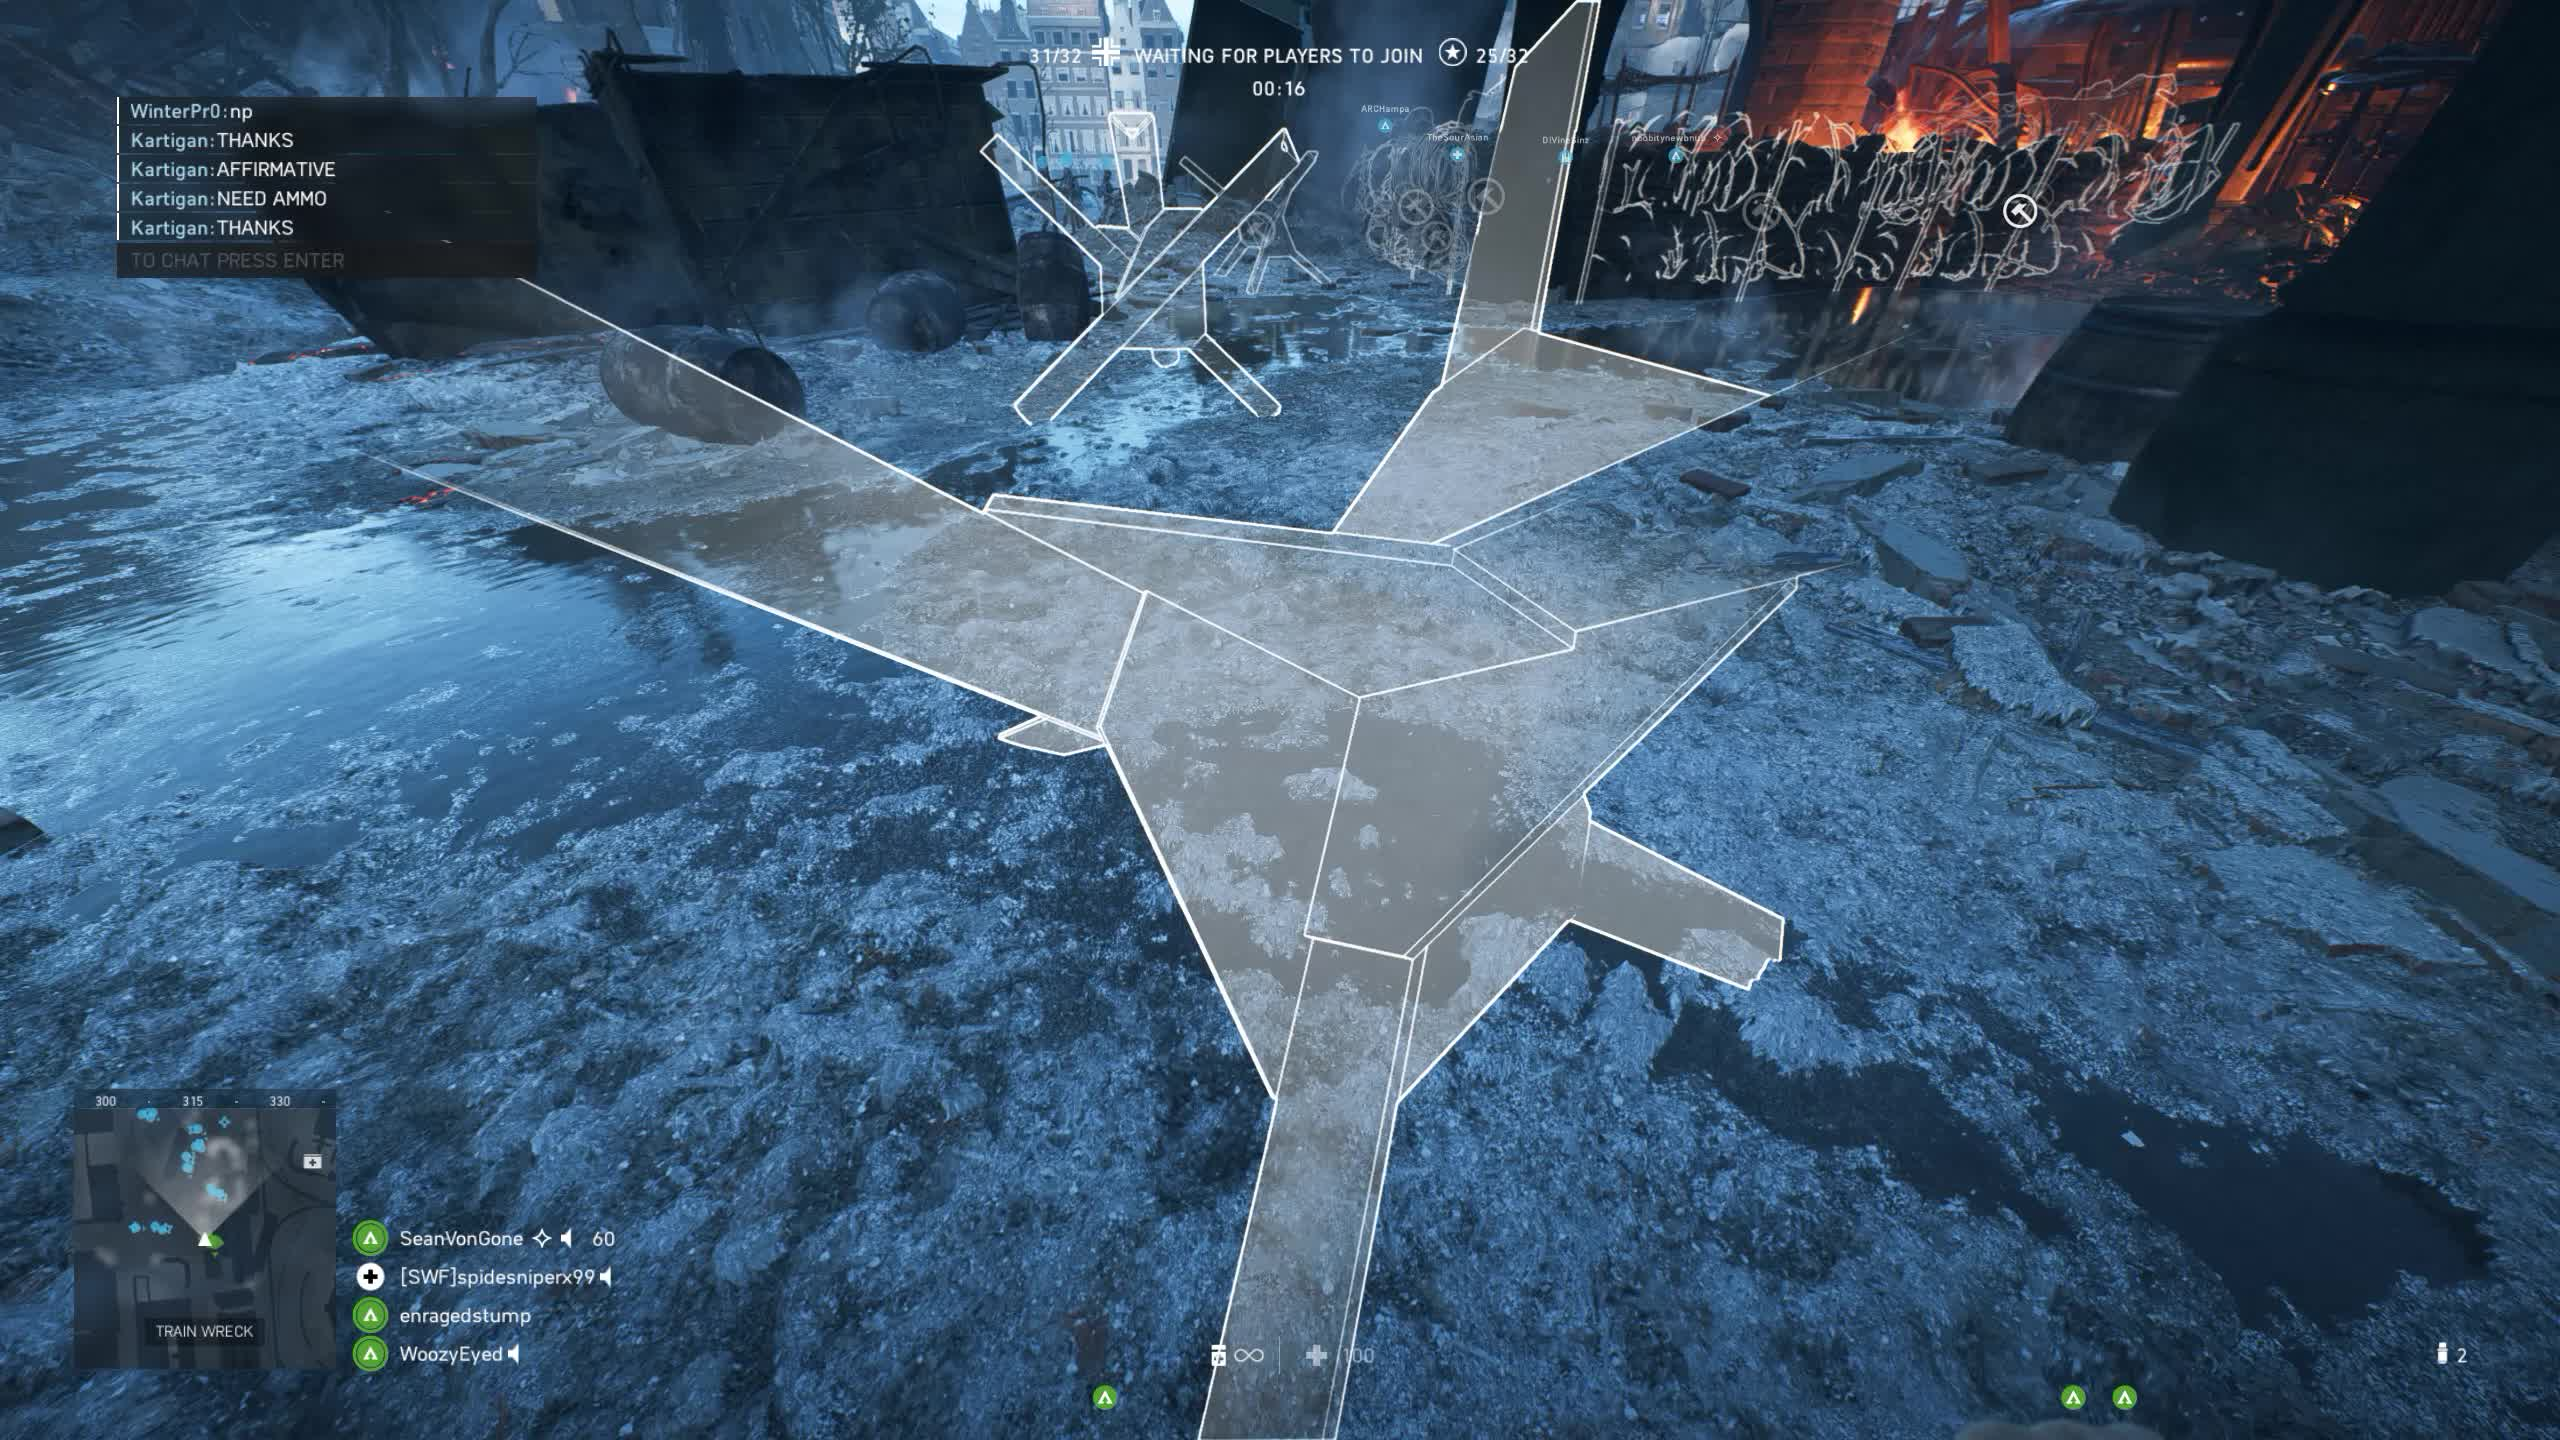 battlefieldv, vlc-record-2018-11-24-21h48m17s-Battlefield V 2018.11.23 - 15.30.07.02.DVR.mp4- GIFs